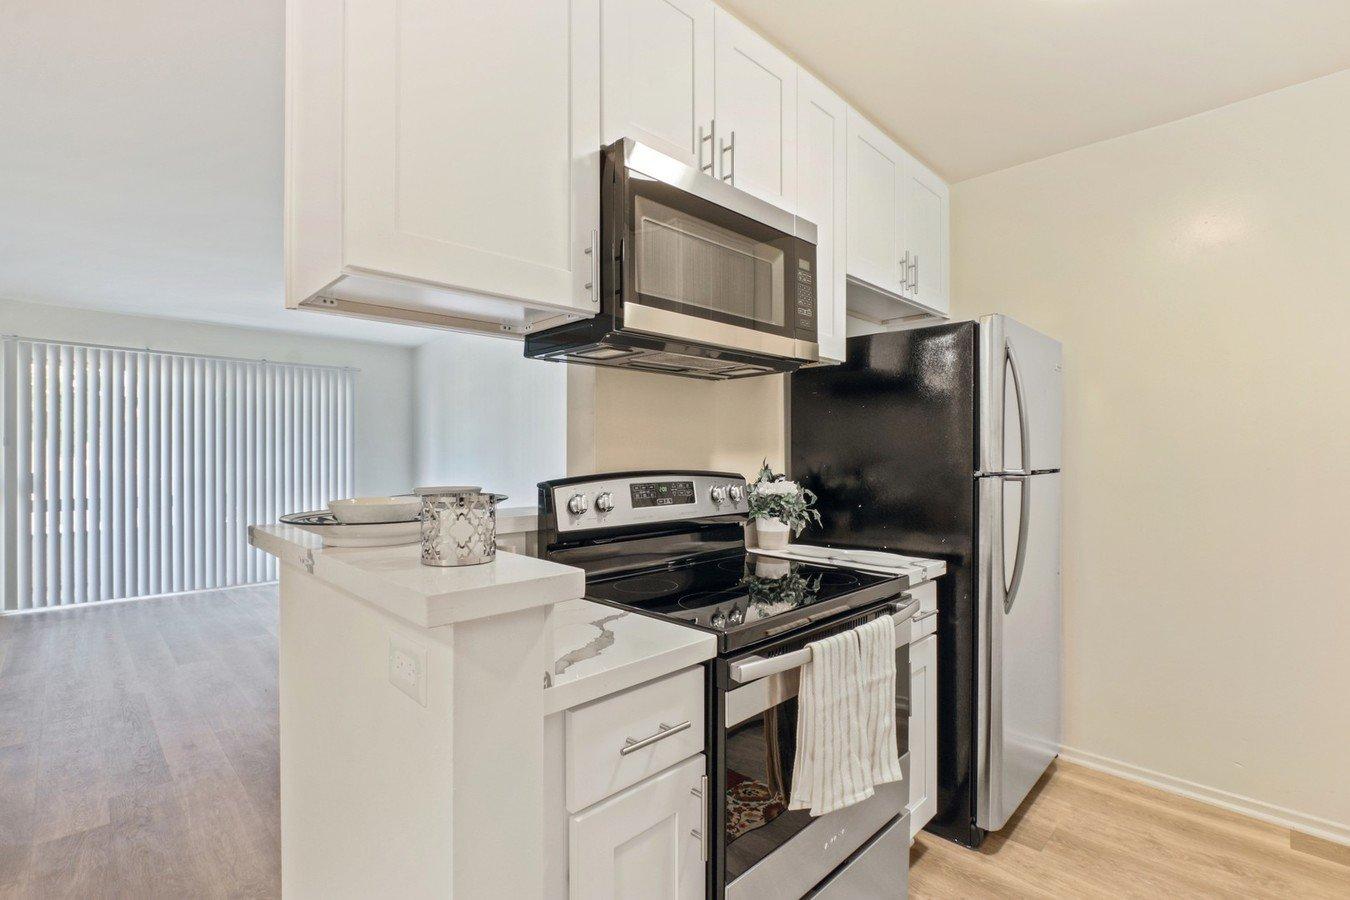 1 Bedroom 1 Bathroom Apartment for rent at Natick Park in Sherman Oaks, CA